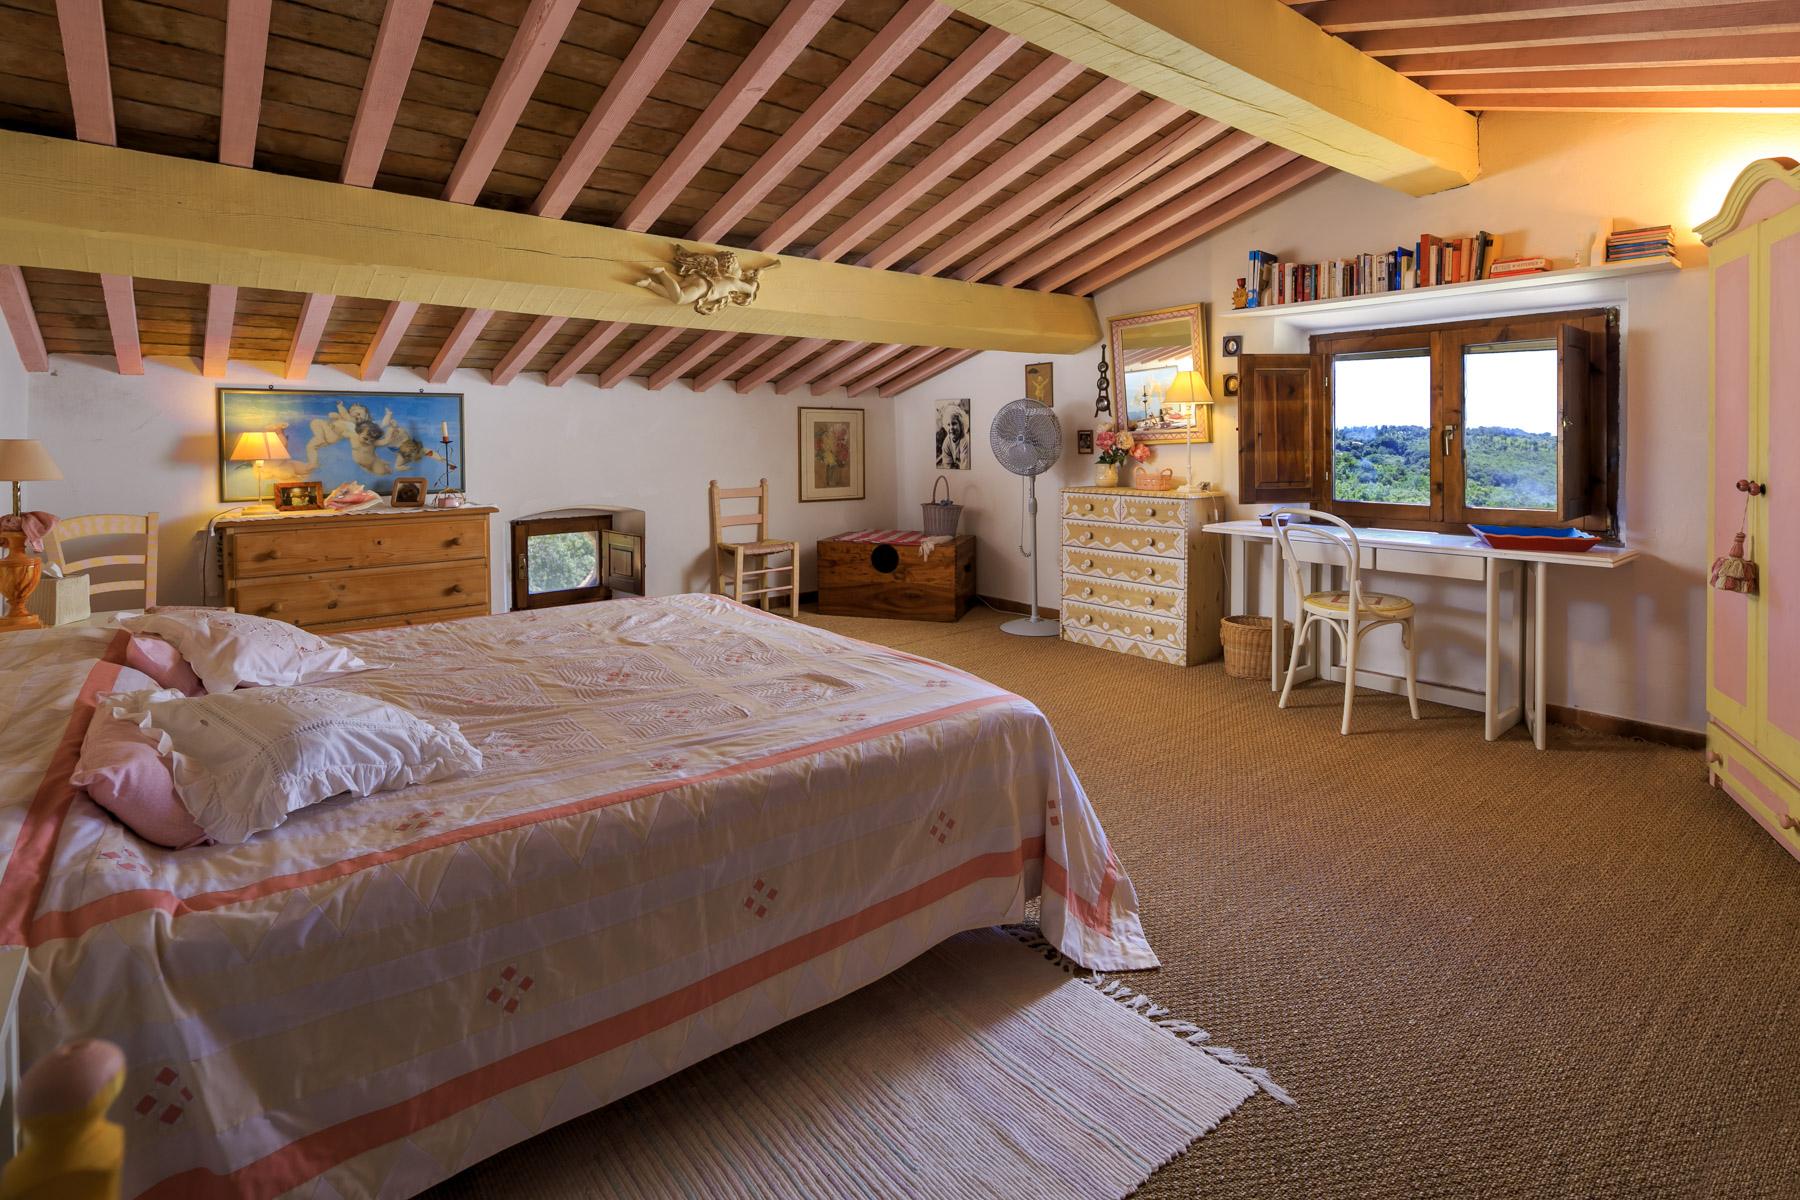 Villa in Vendita a Santa Luce: 5 locali, 270 mq - Foto 17